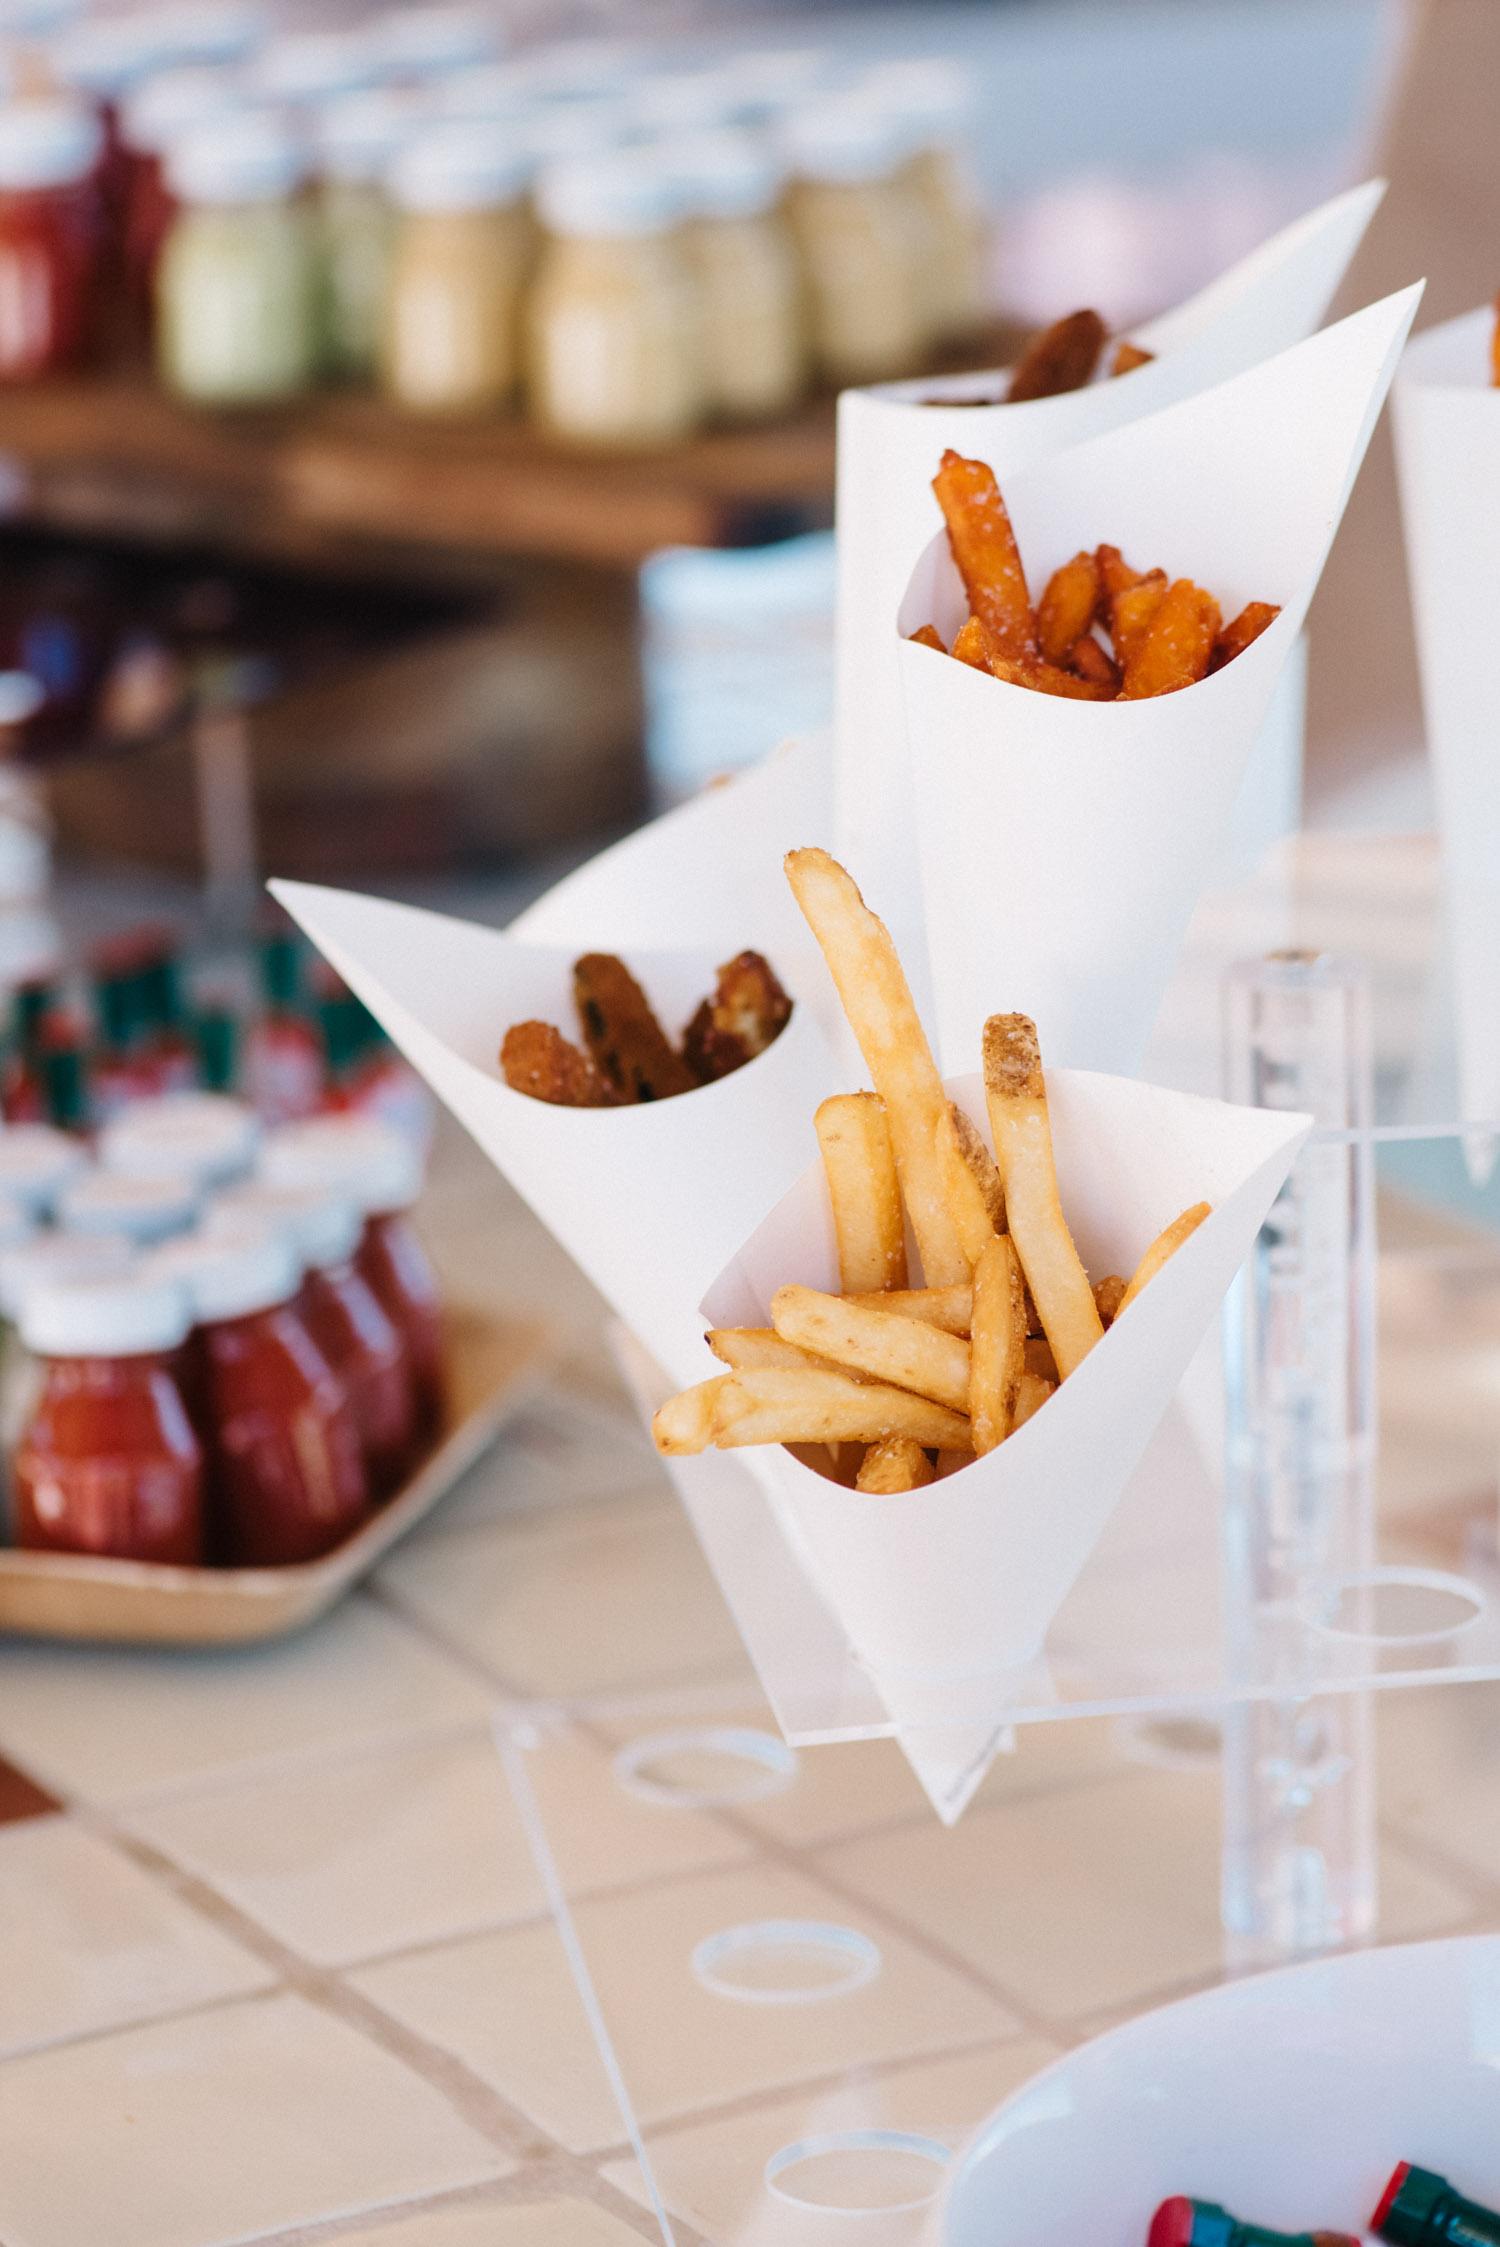 """Fry Bar"" -  F10 Catering  image credit:  Sarah Dickenson"